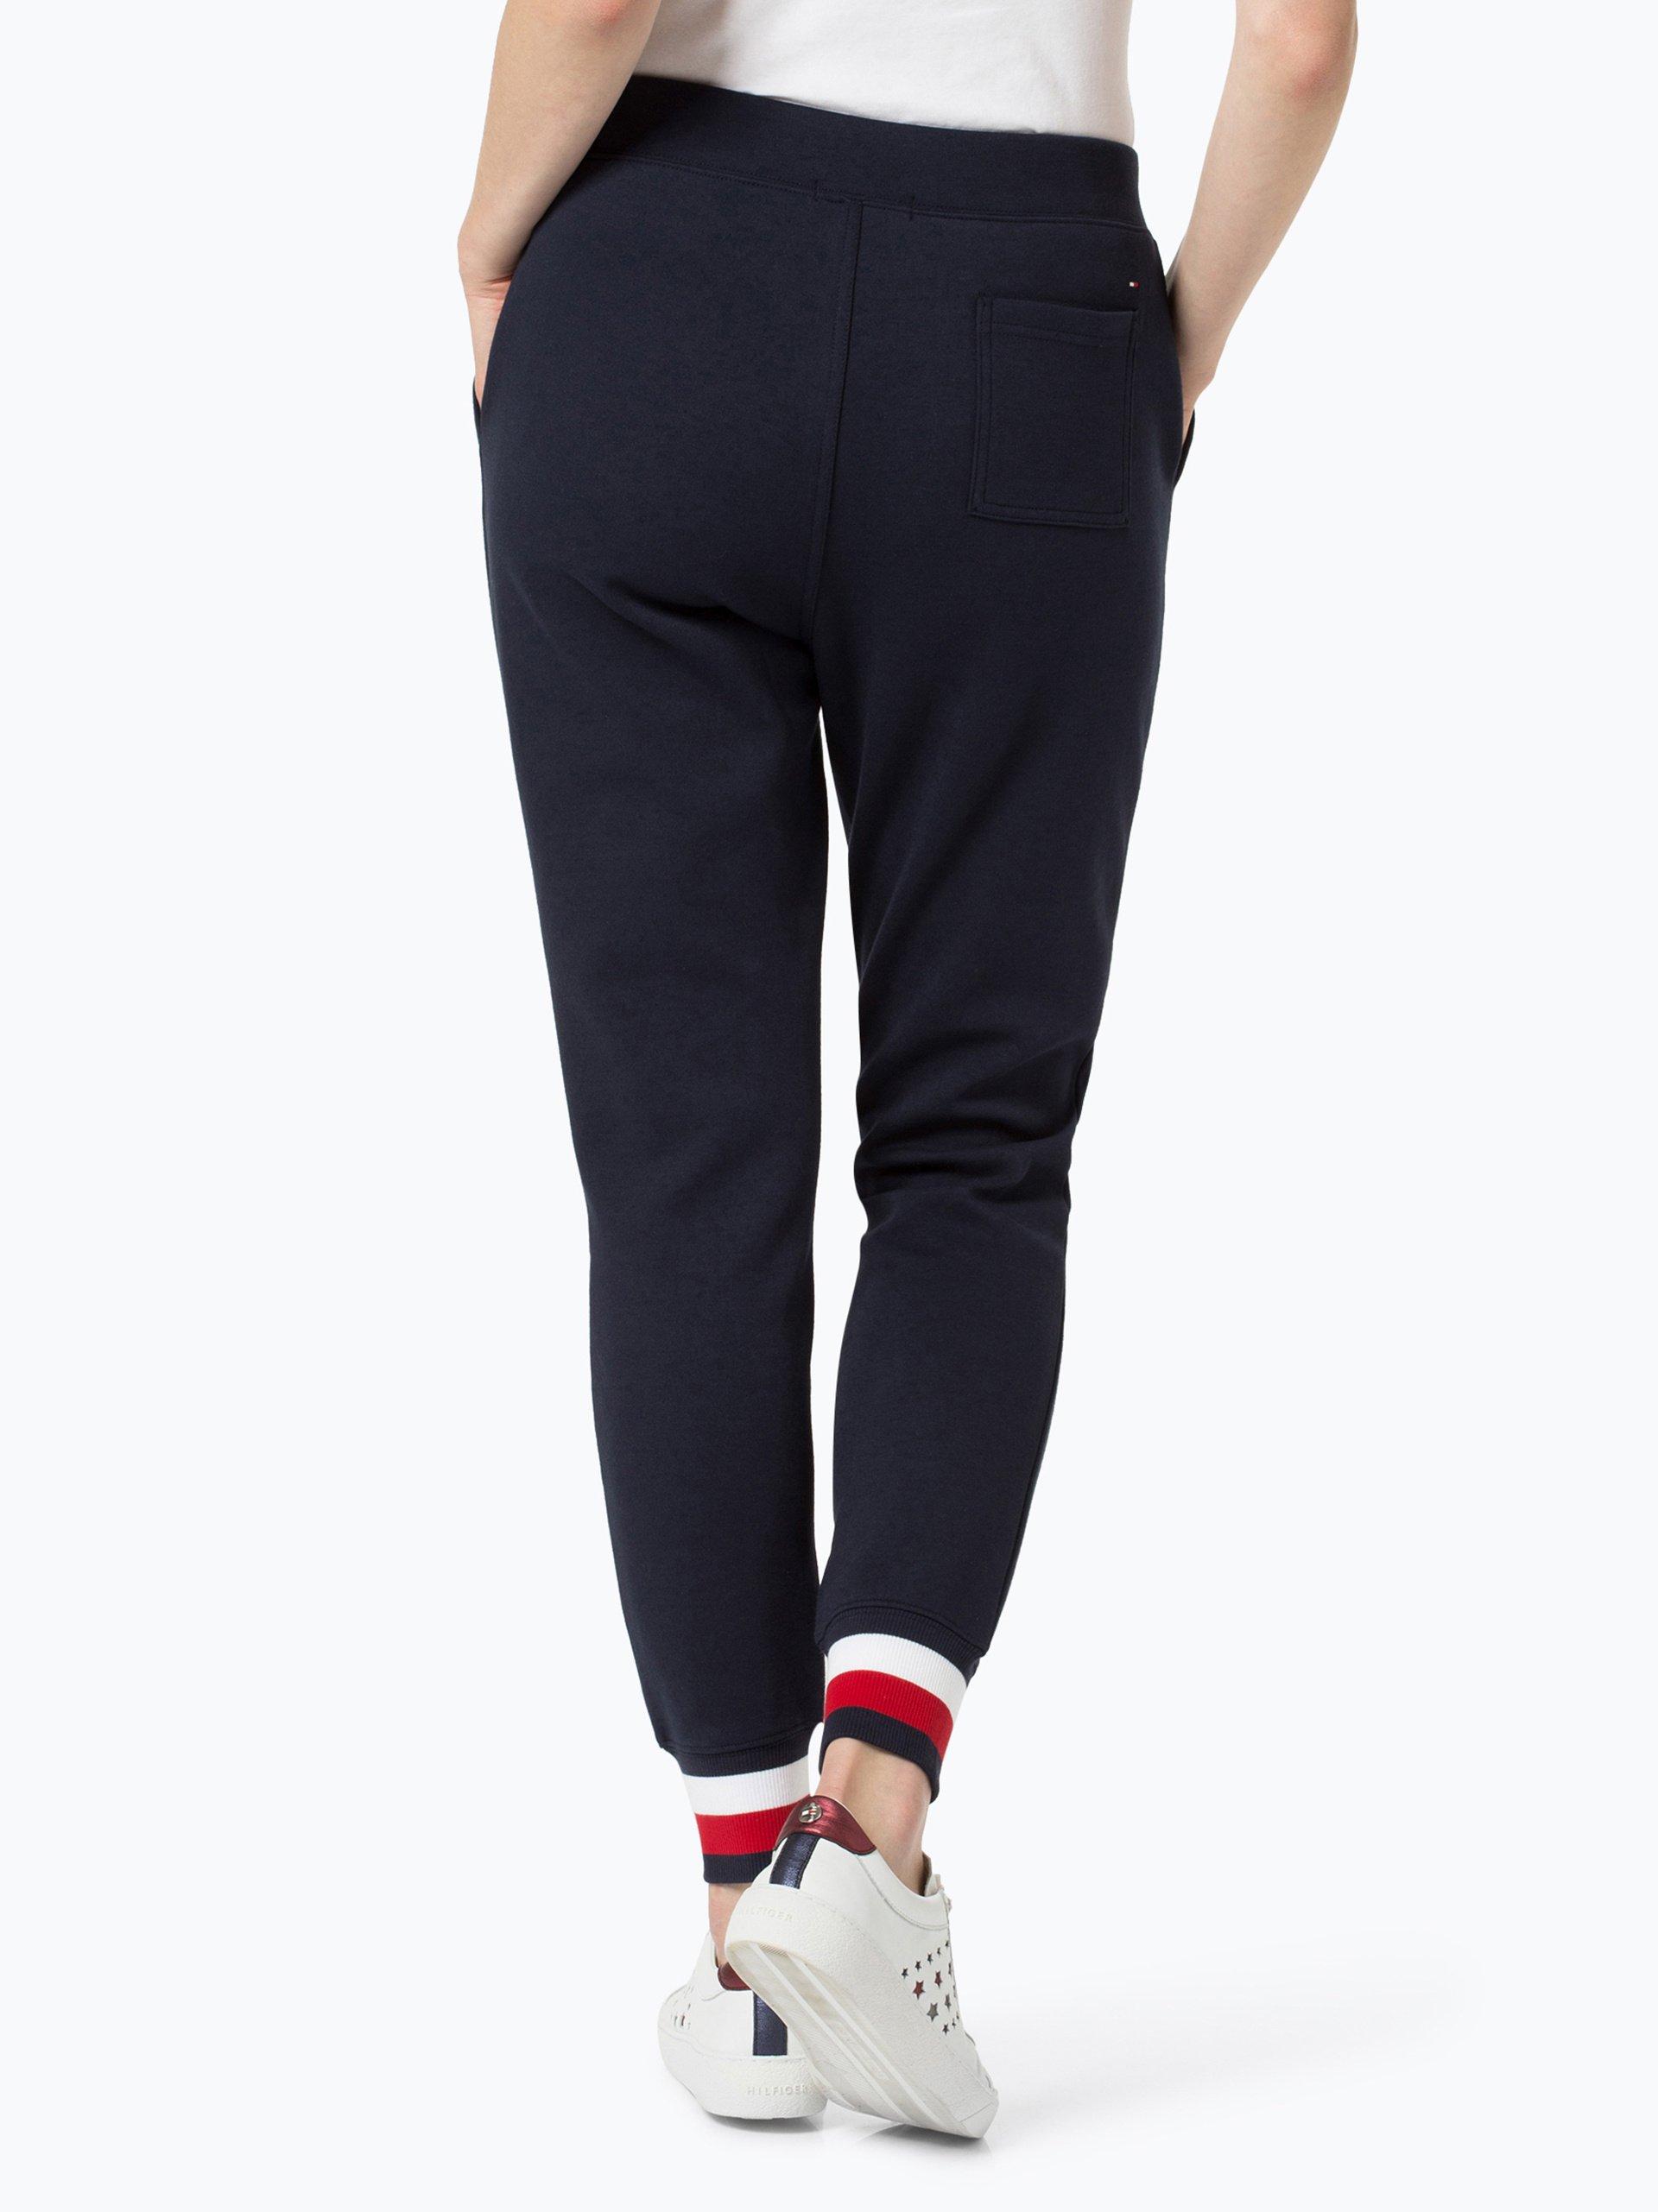 8a44cf6f88a73 Tommy Hilfiger Damskie spodnie dresowe — Trisha kup online ...